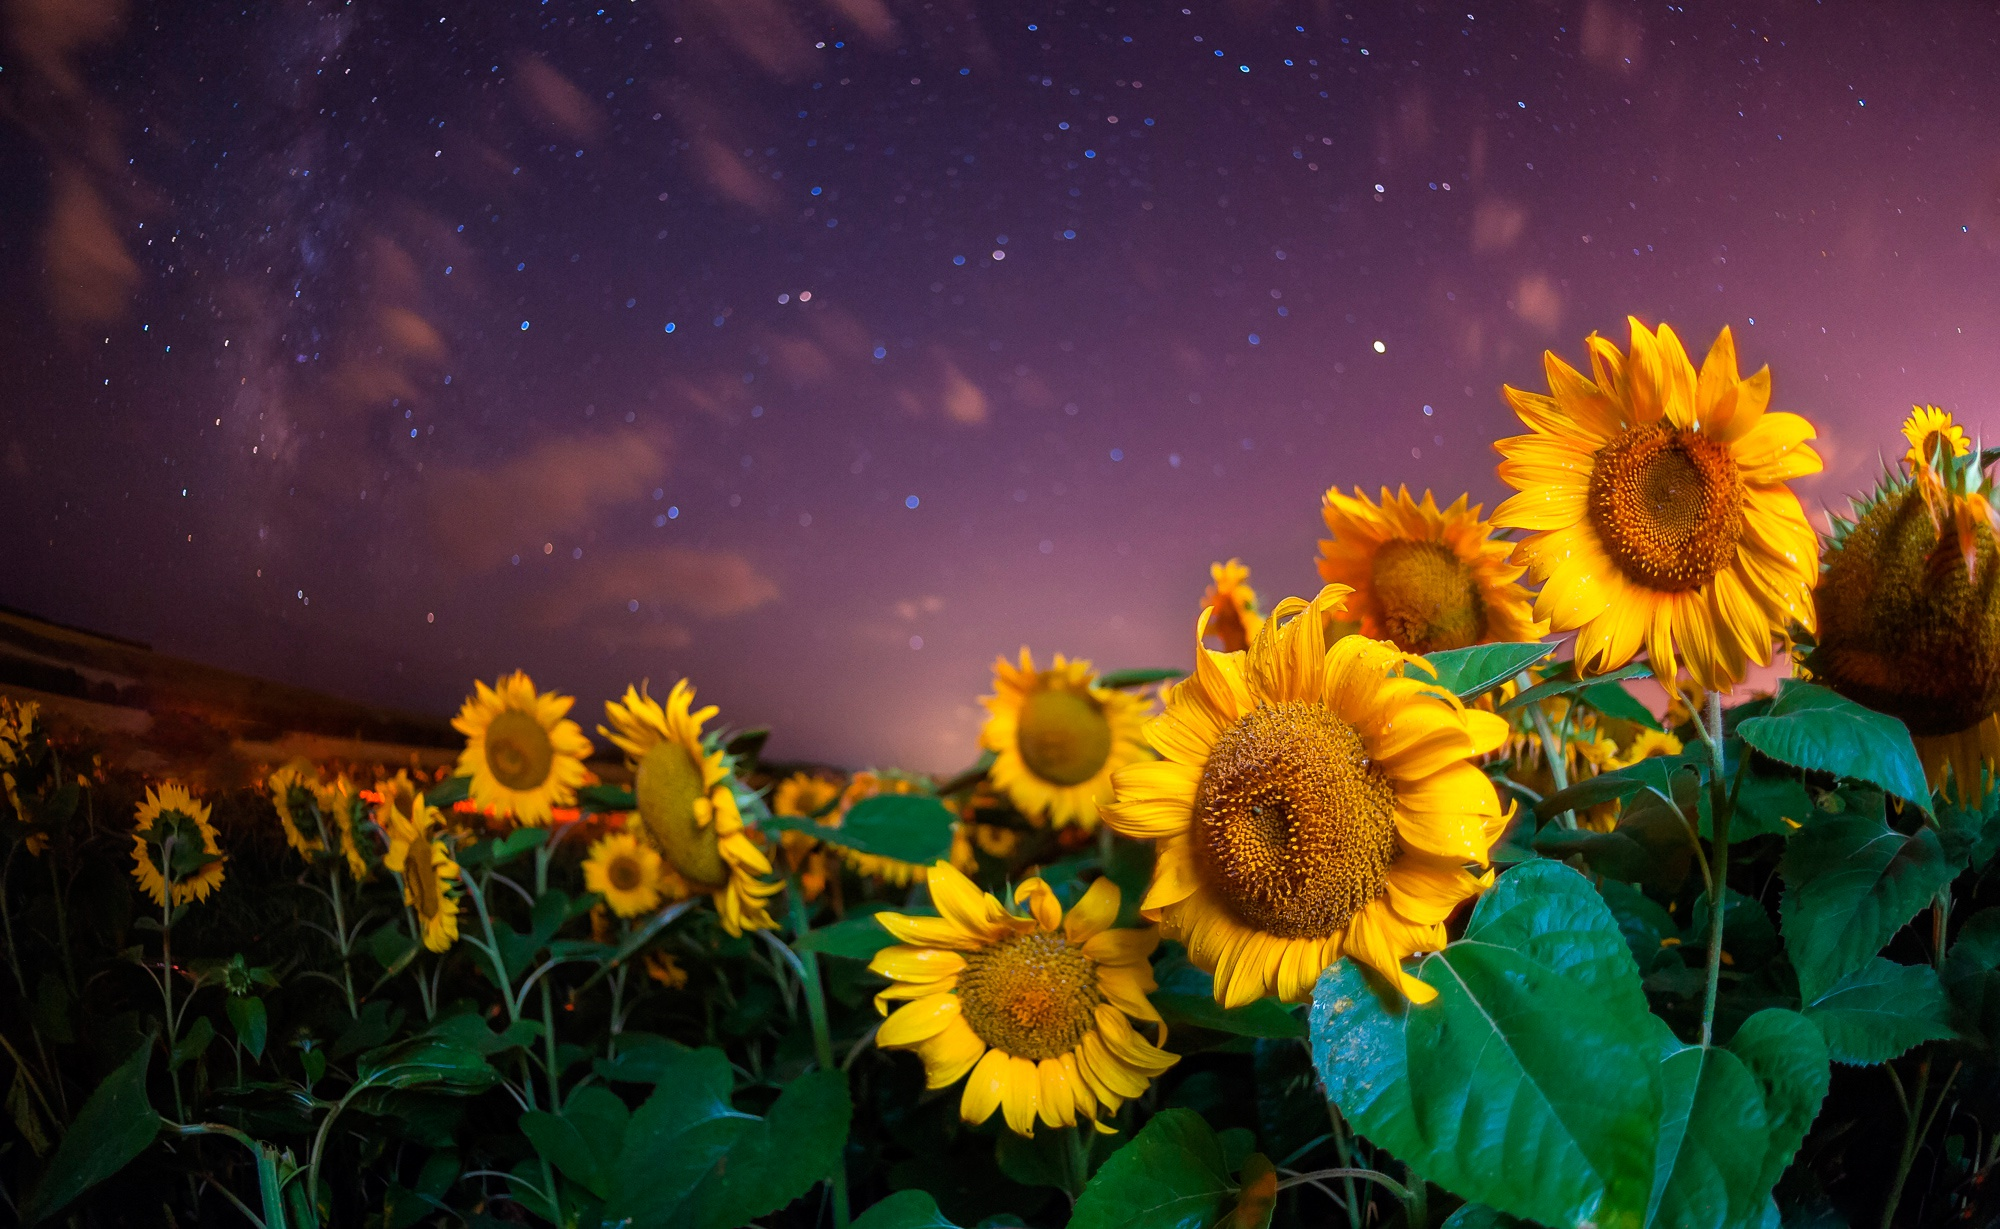 Sunflower Iphone Wallpaper Sunflower Hd Wallpaper Background Image 2000x1229 Id